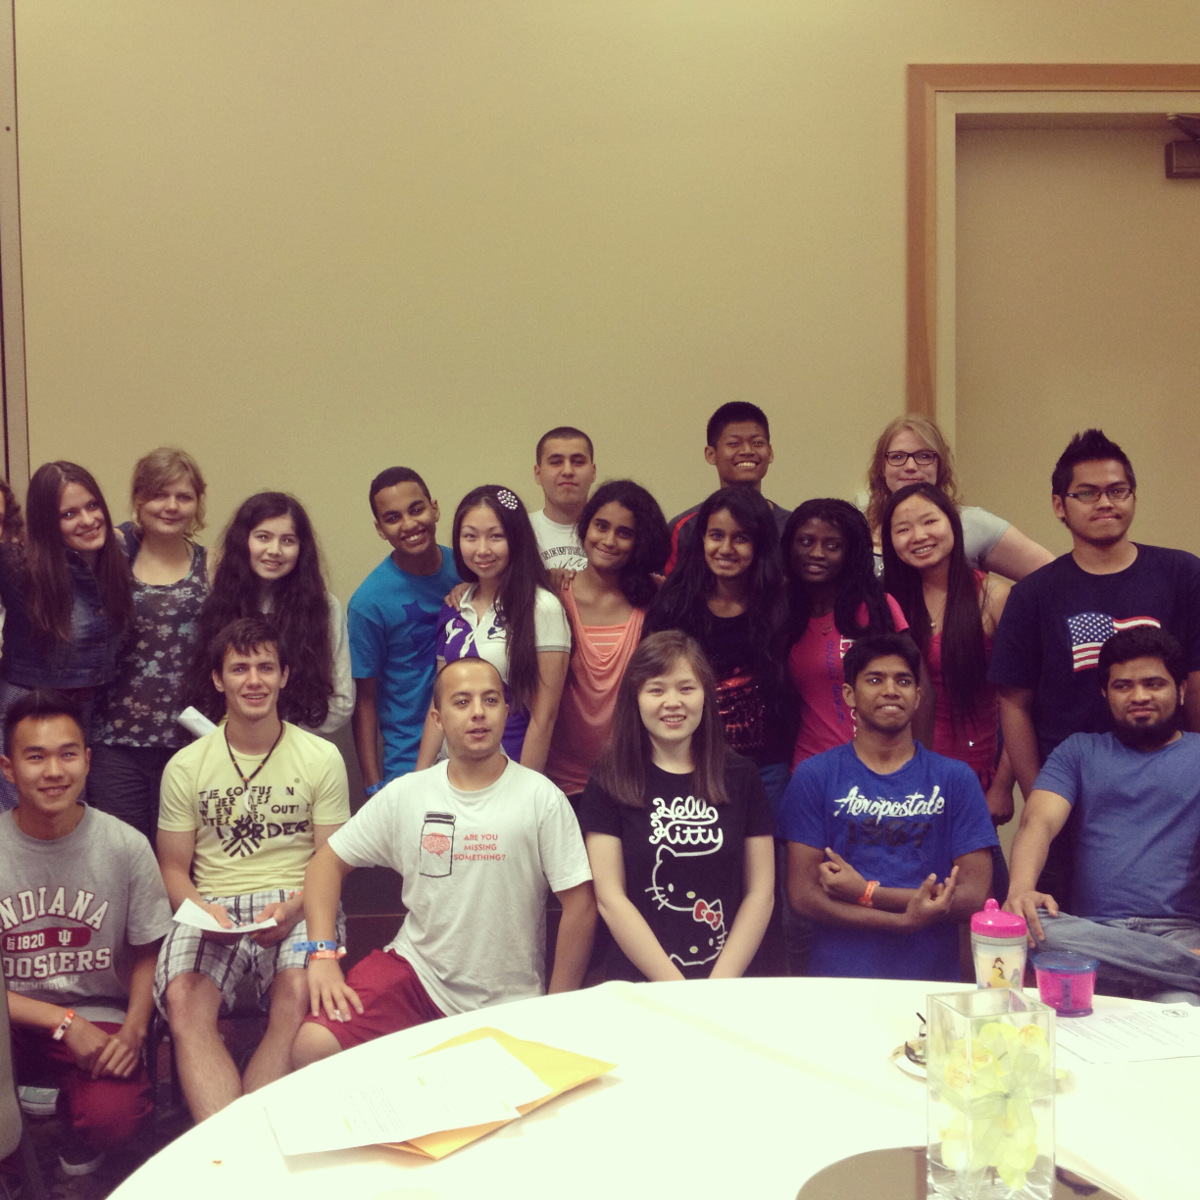 Ориентационная неделя студентов. Циннциннати, Огайо